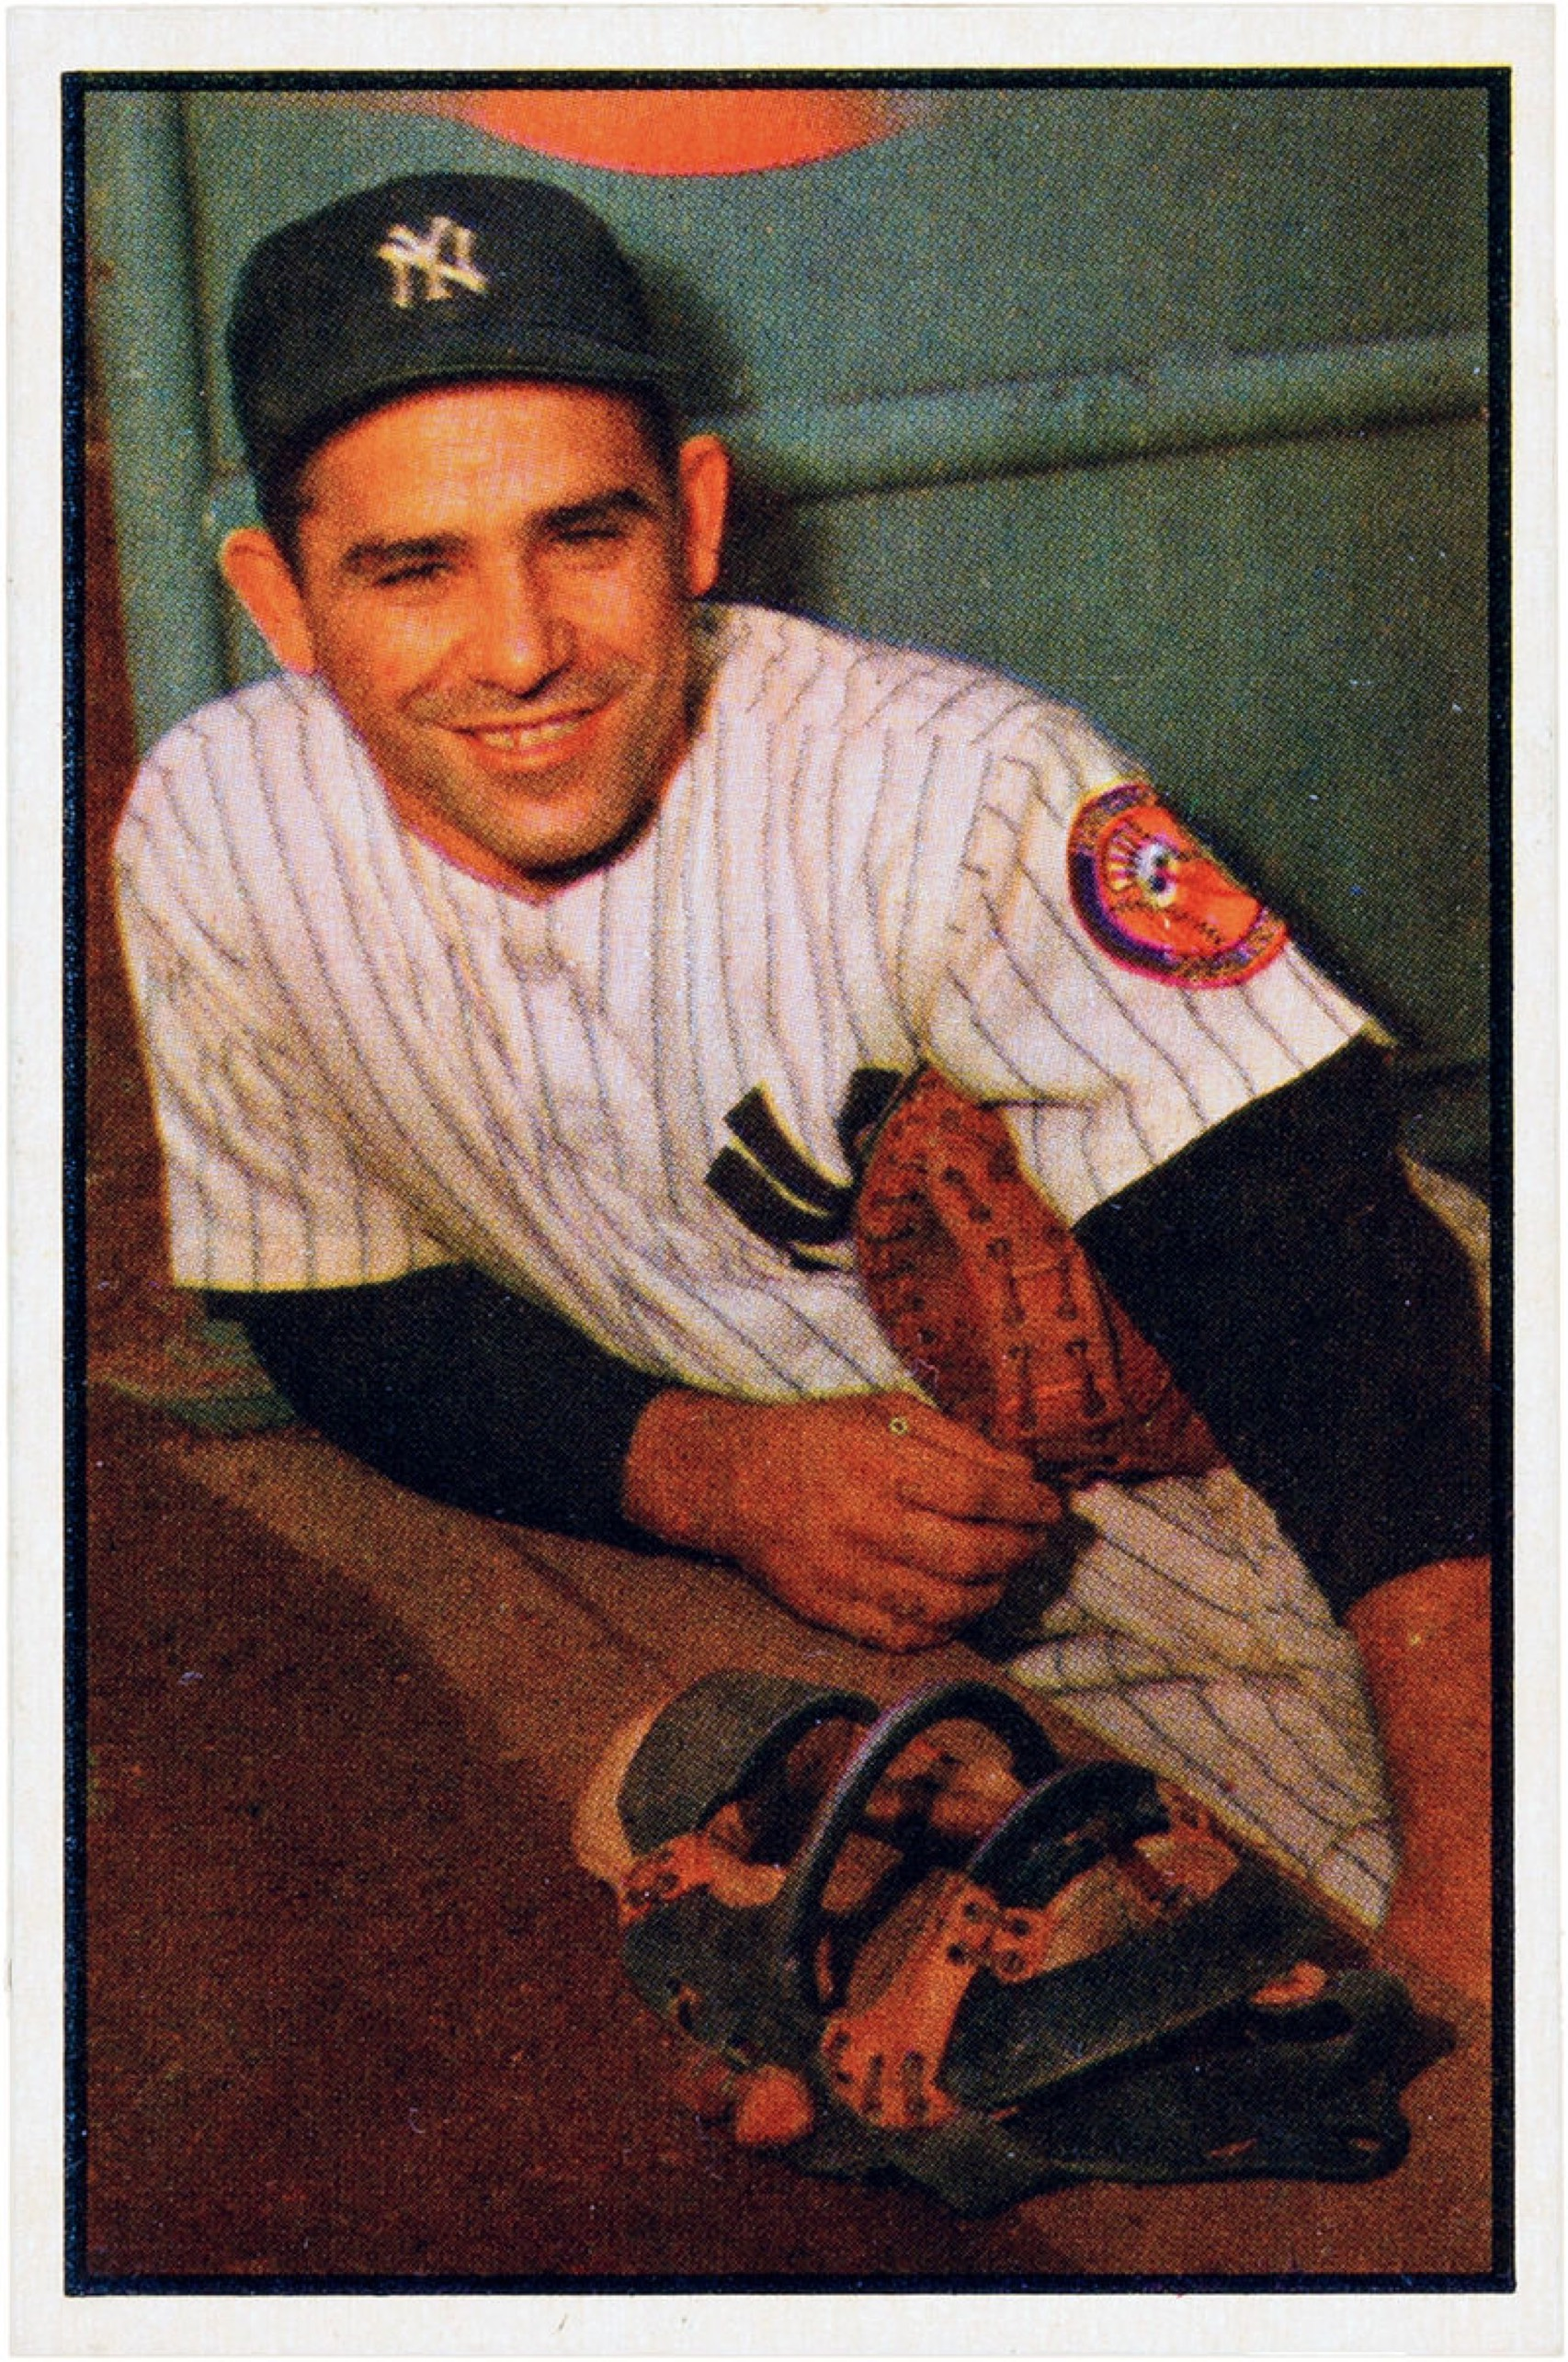 1953 Bowman Yogi Berra